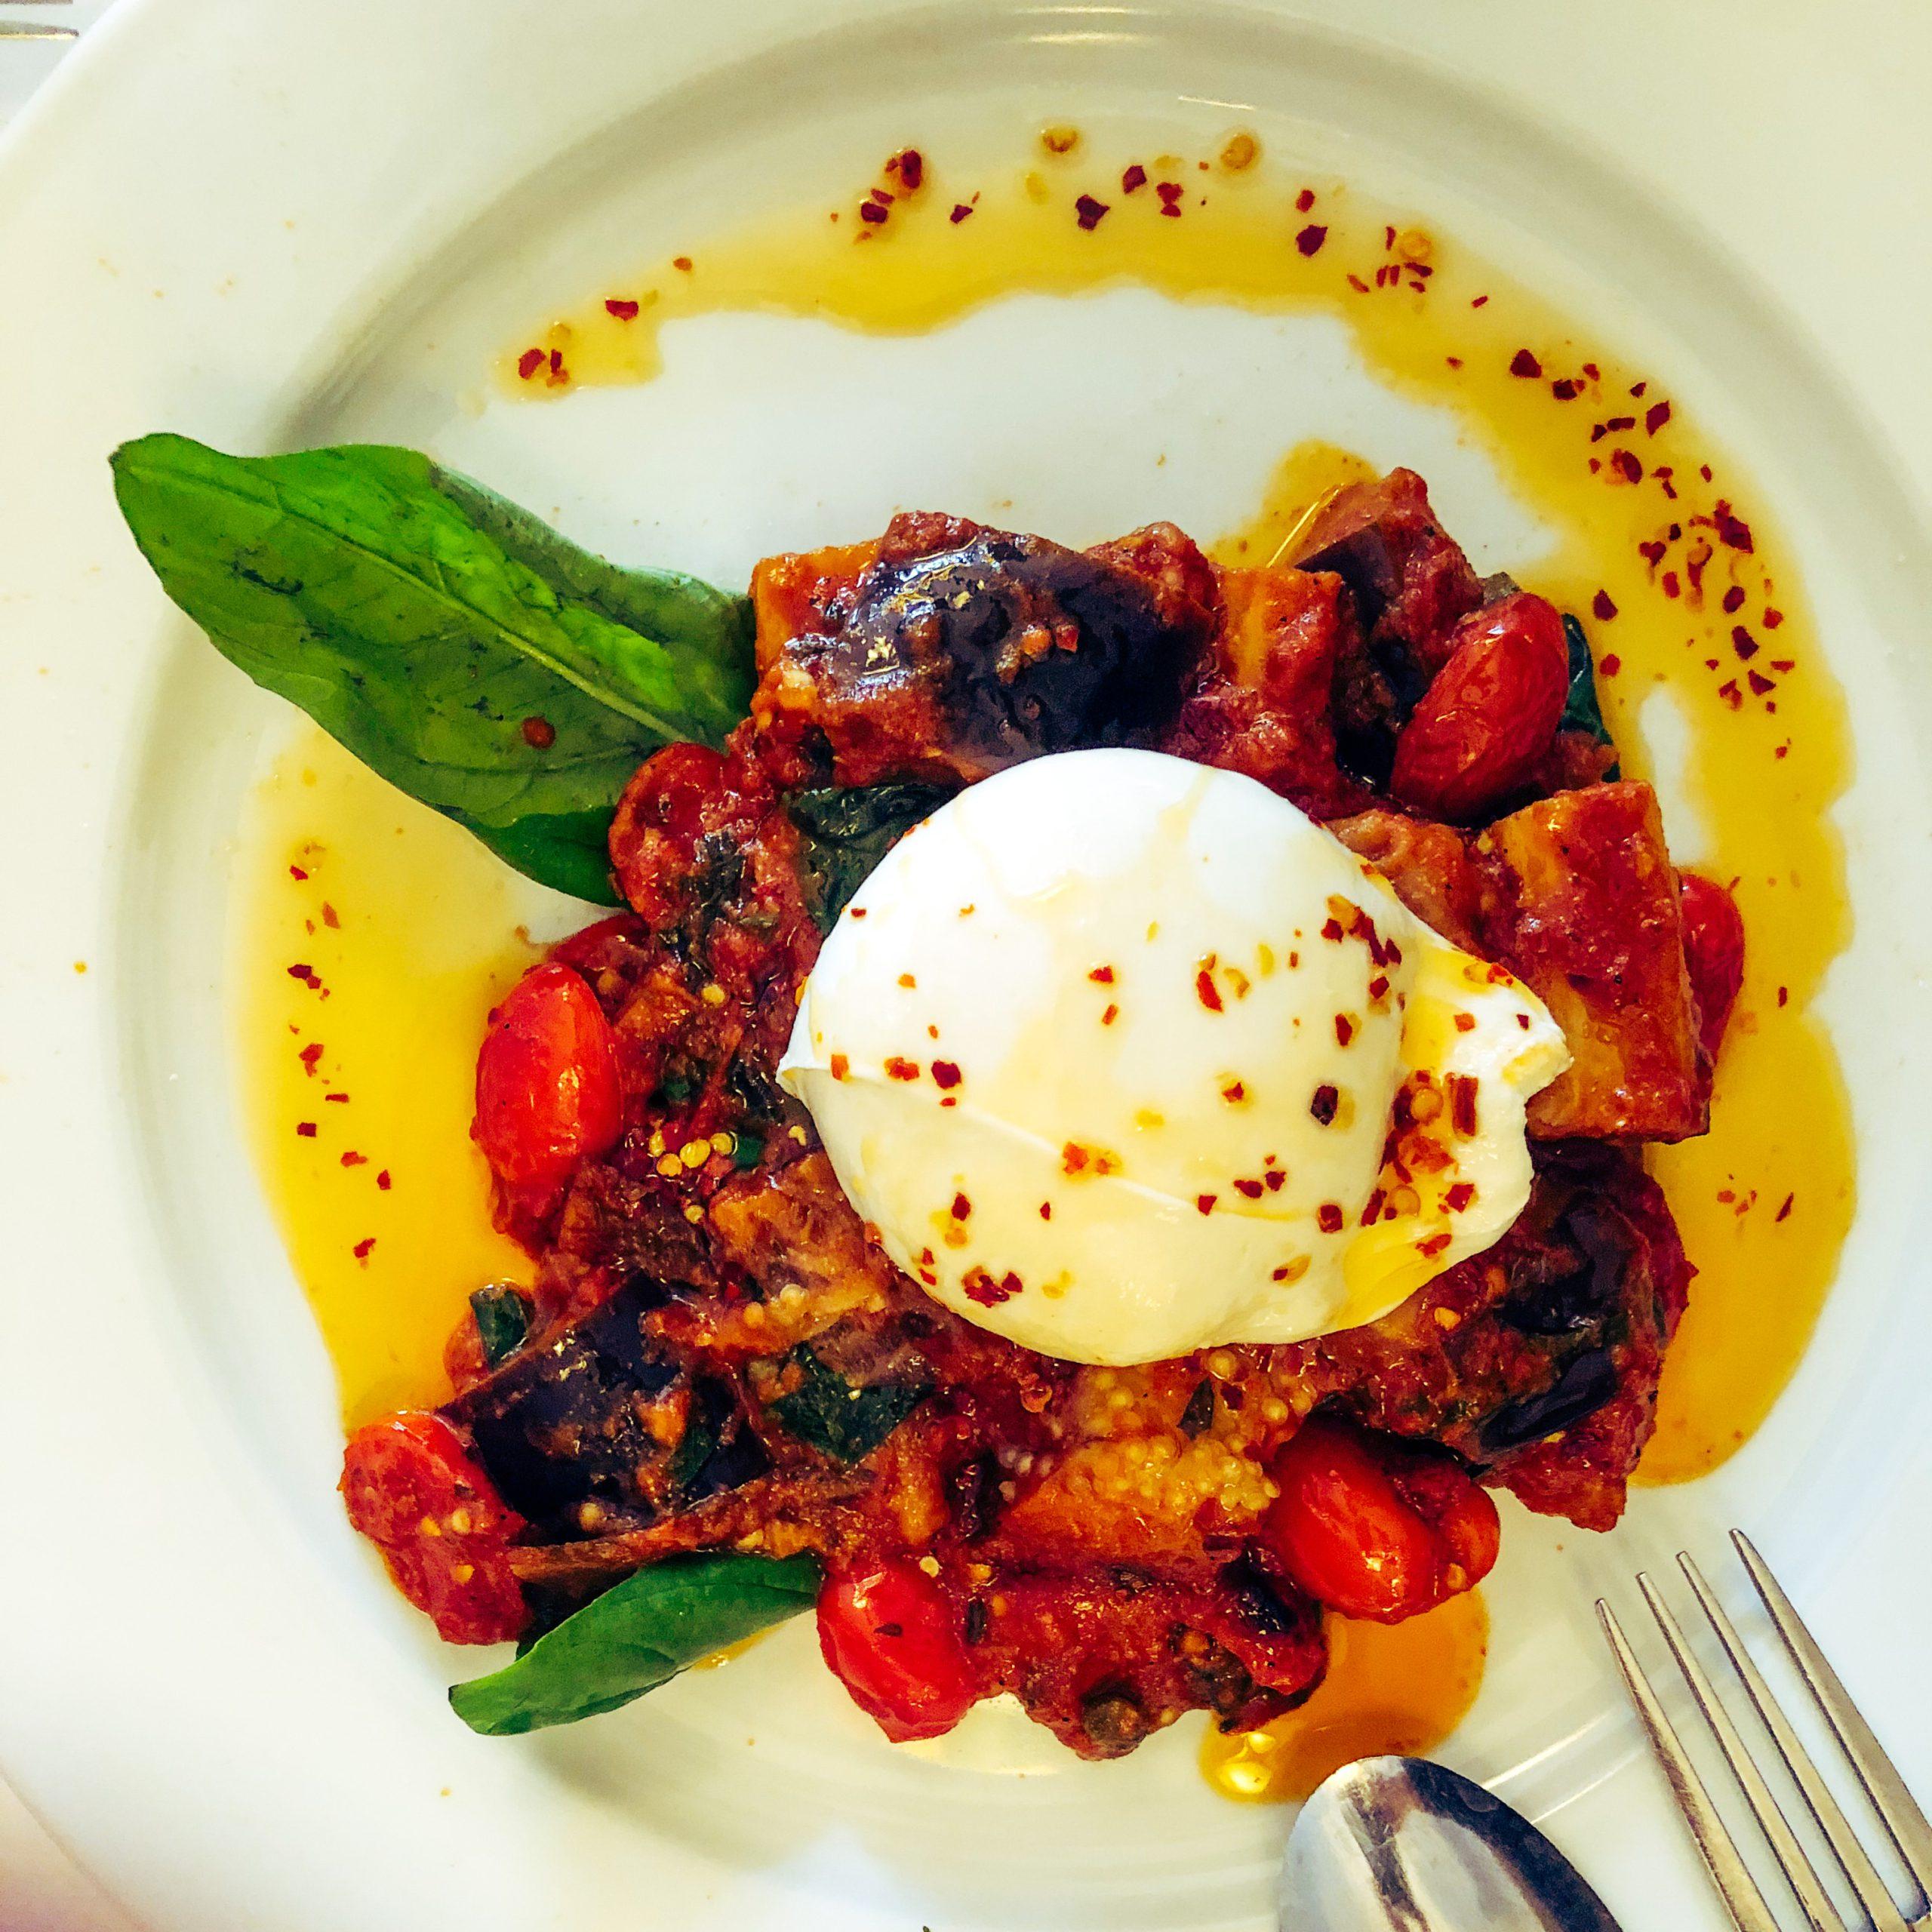 Celebrate Restaurant Week In The Historic Arthur Avenue Neighborhood Of The Bronx